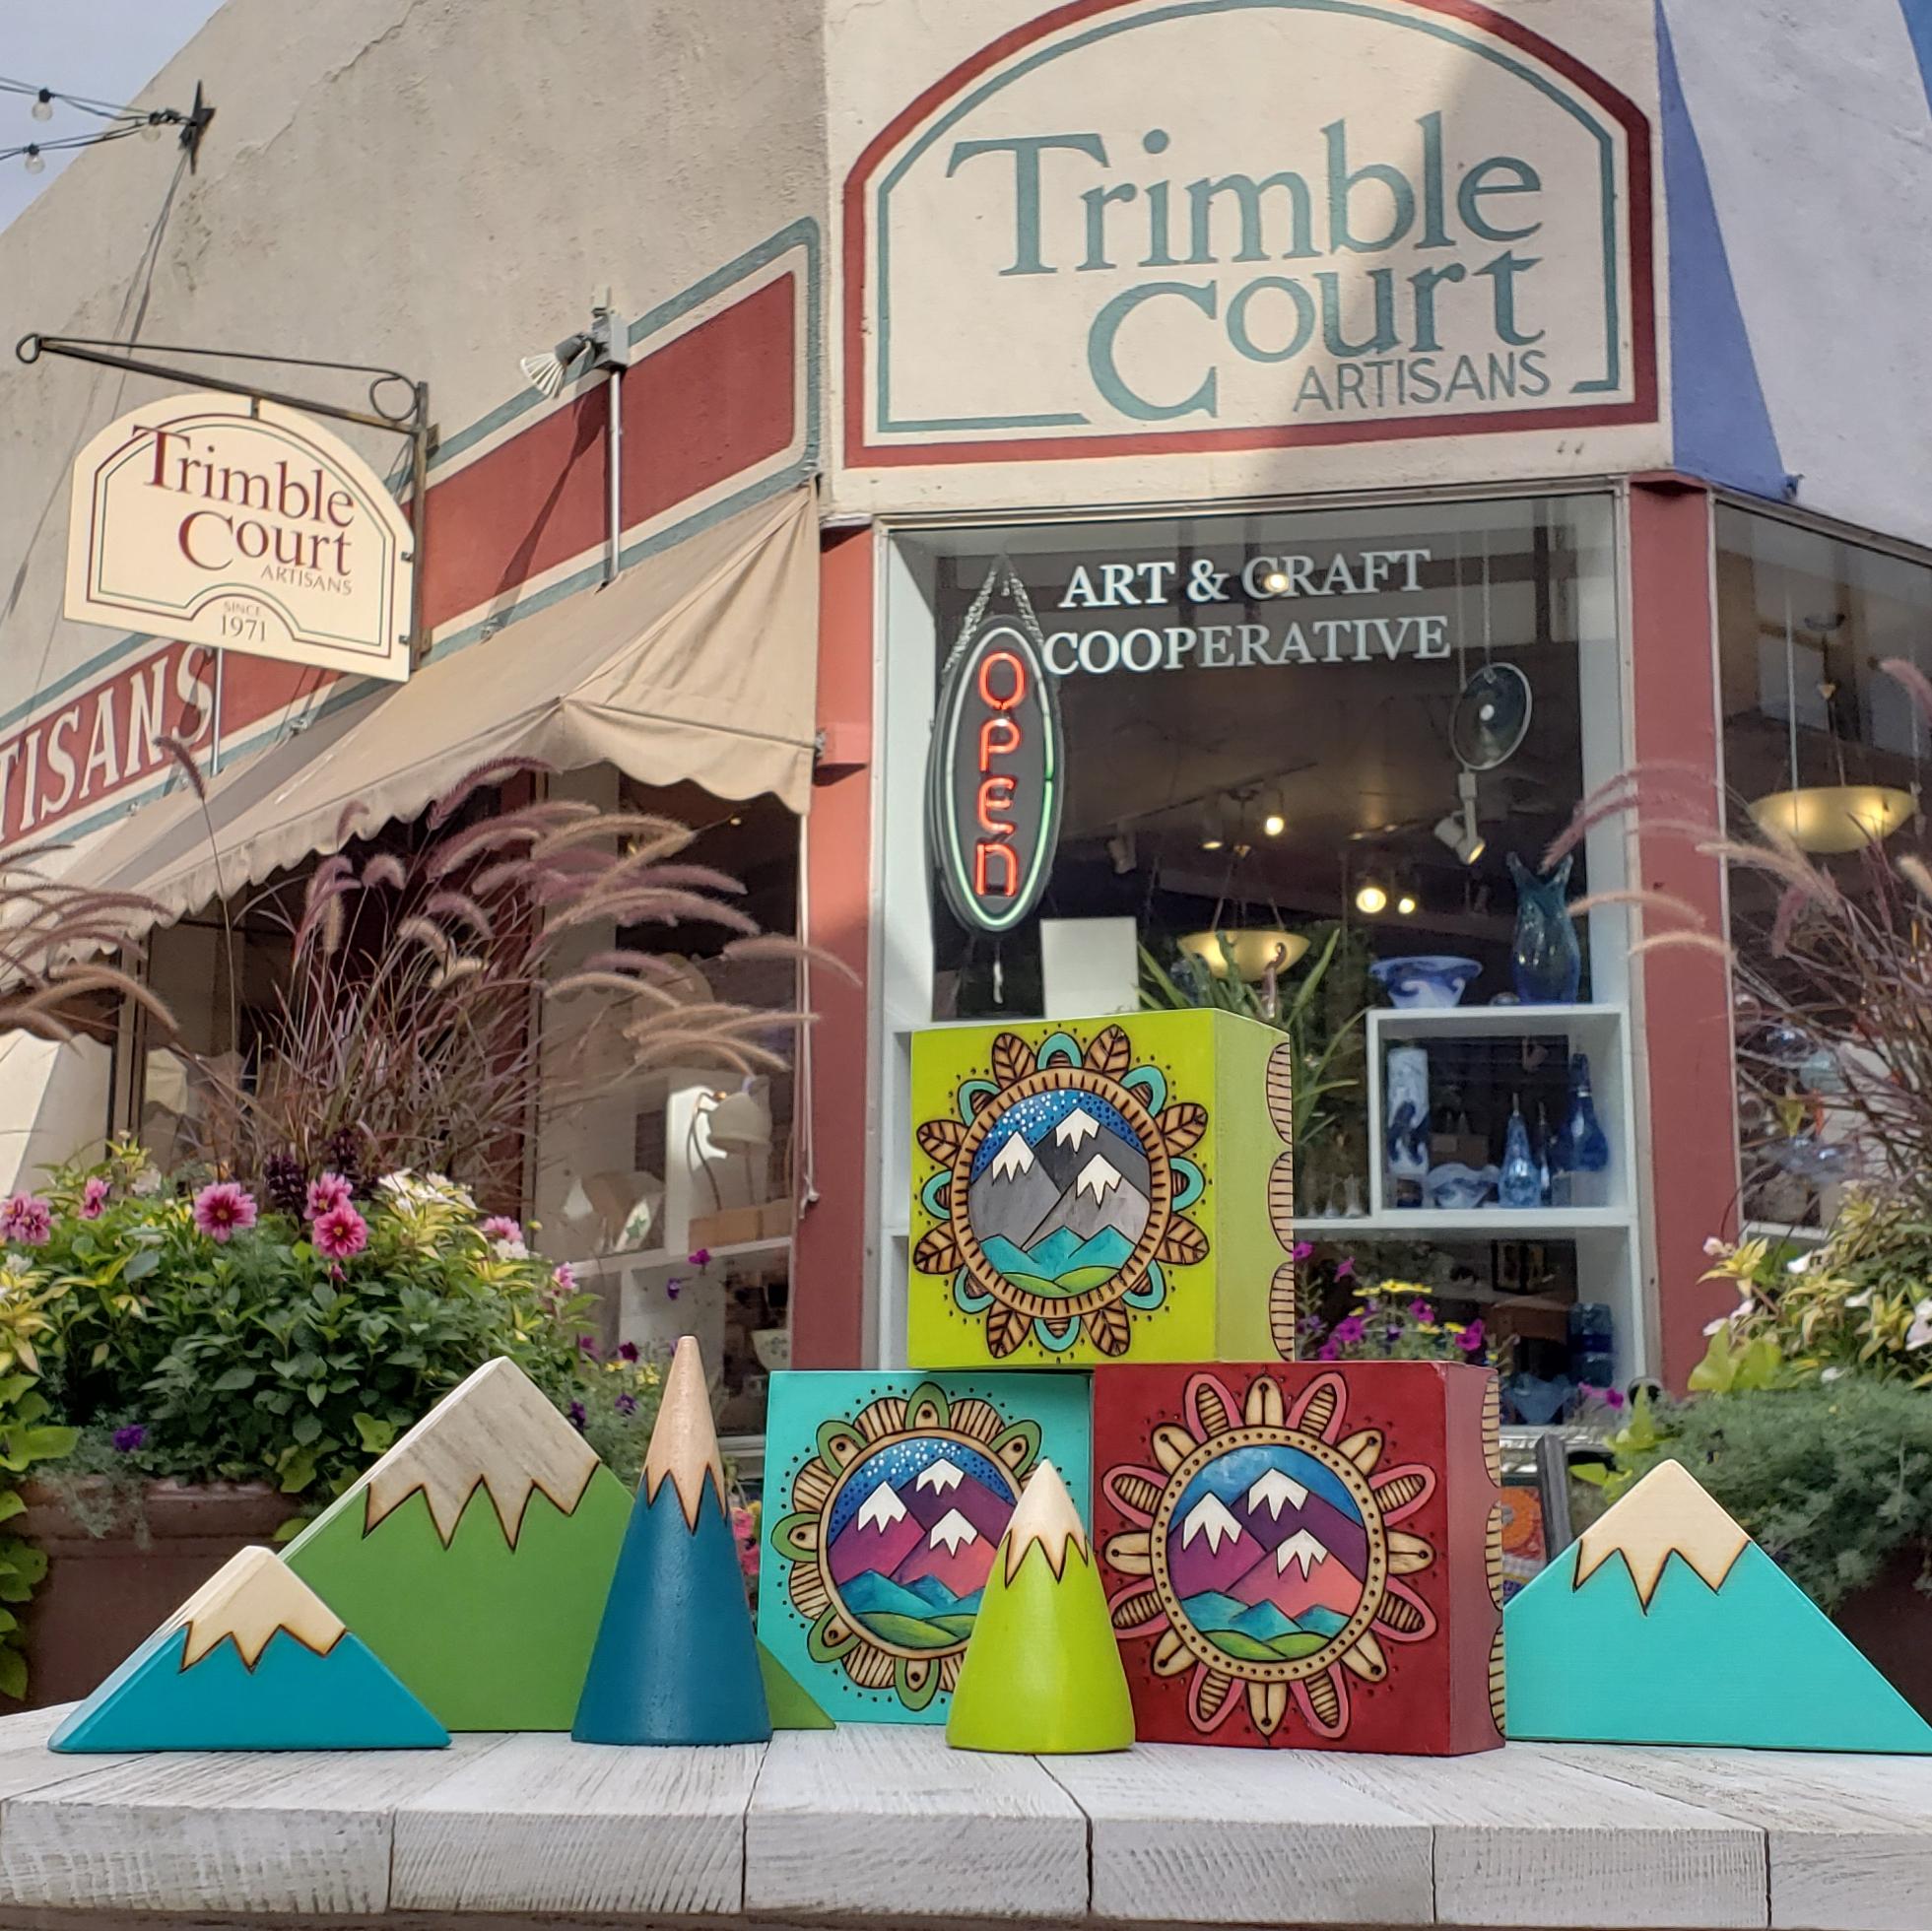 Trimble Court Artisans